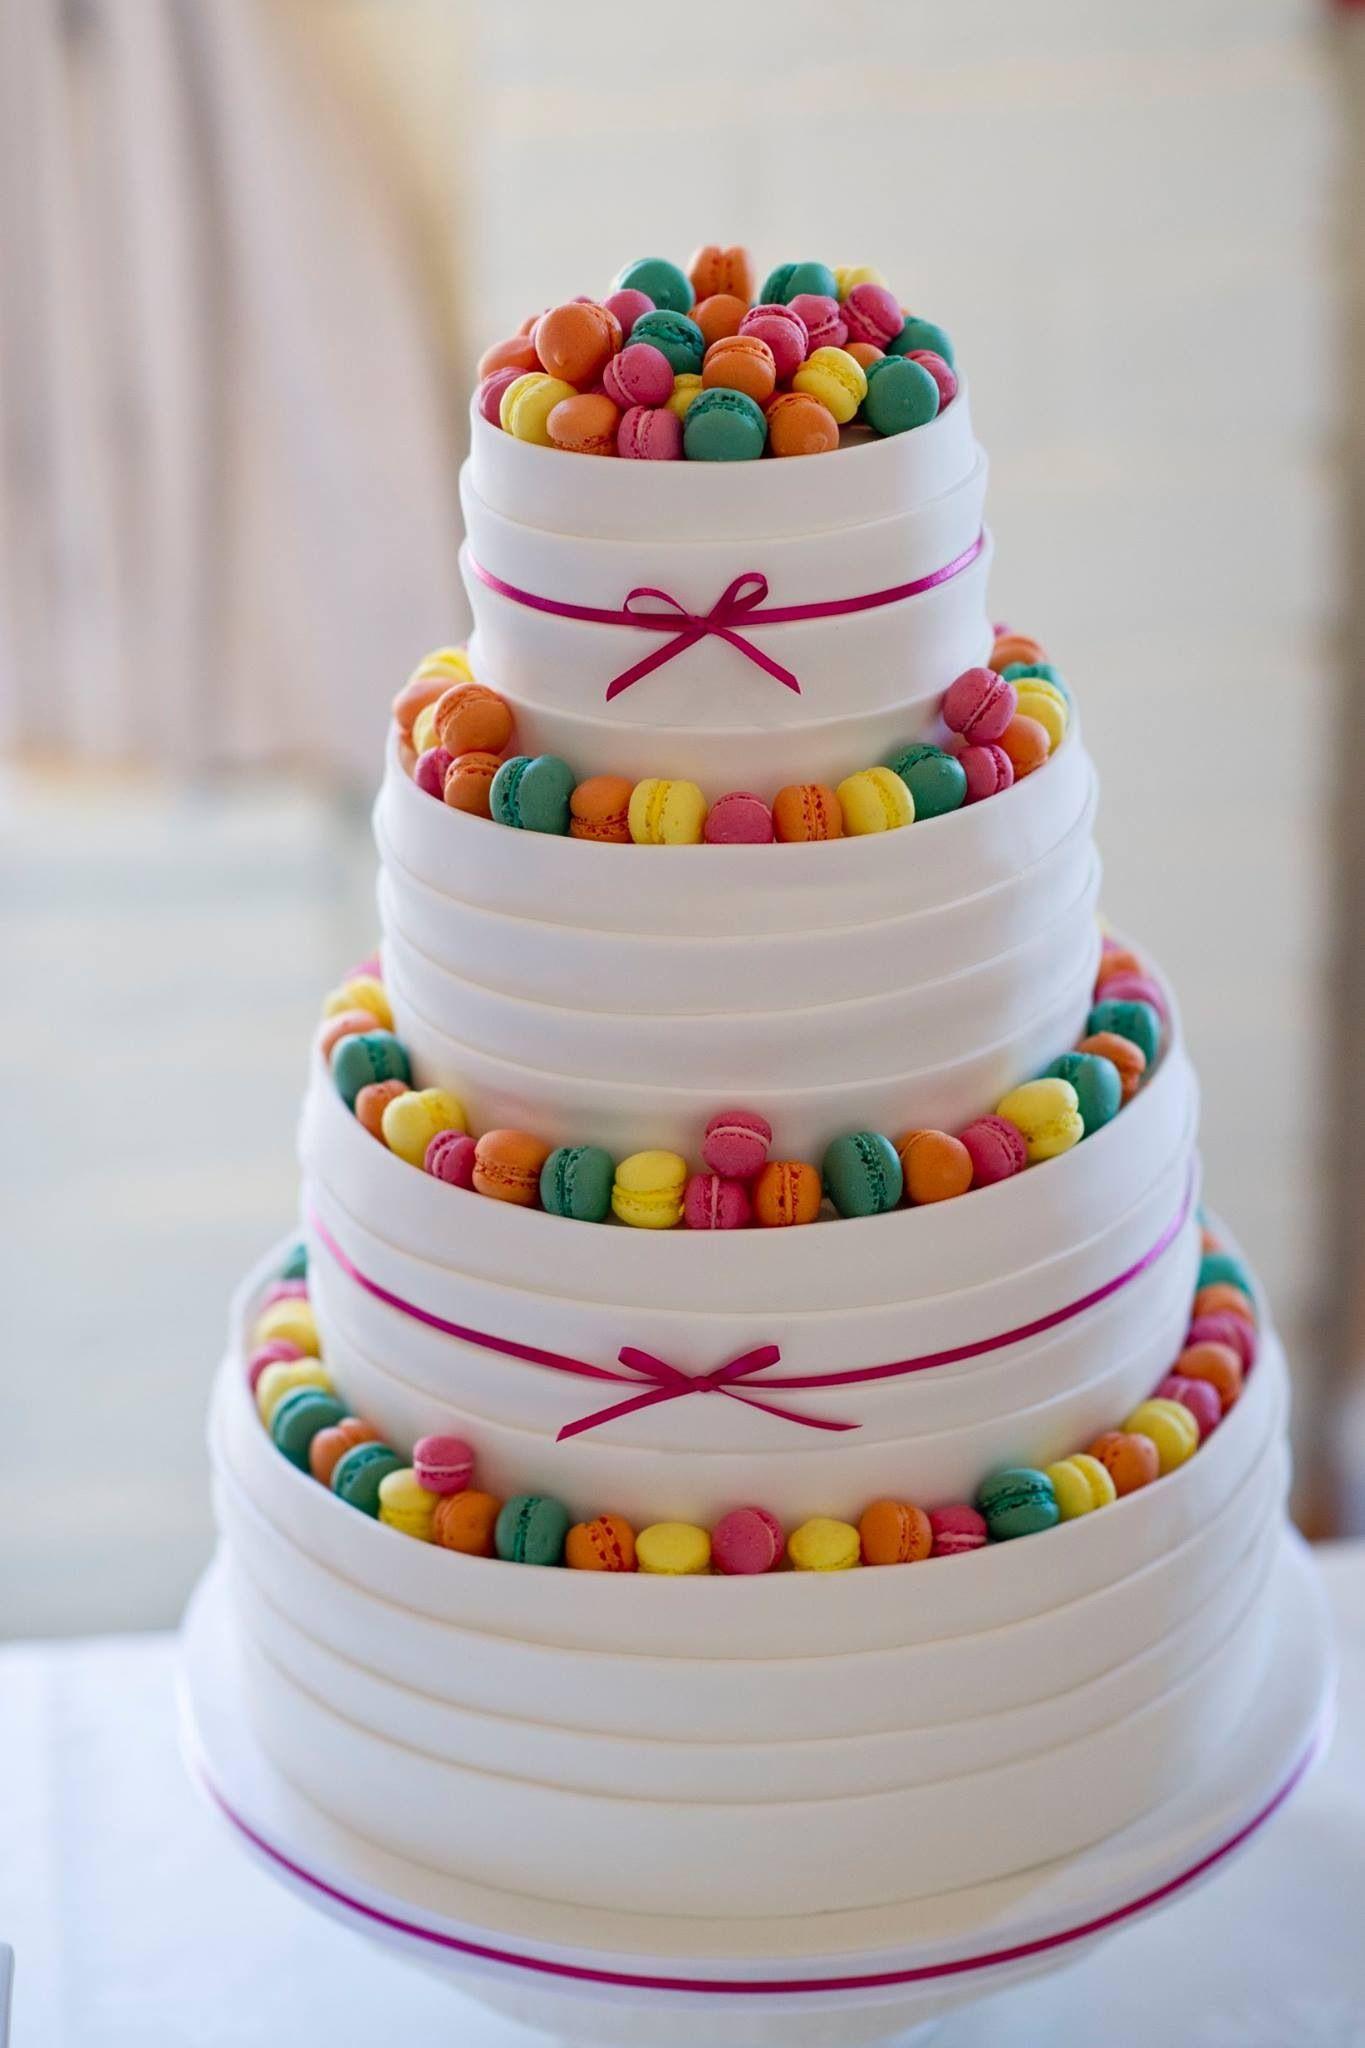 Mini macaron wedding cake - something a bit different and fun - Cakes by Karen